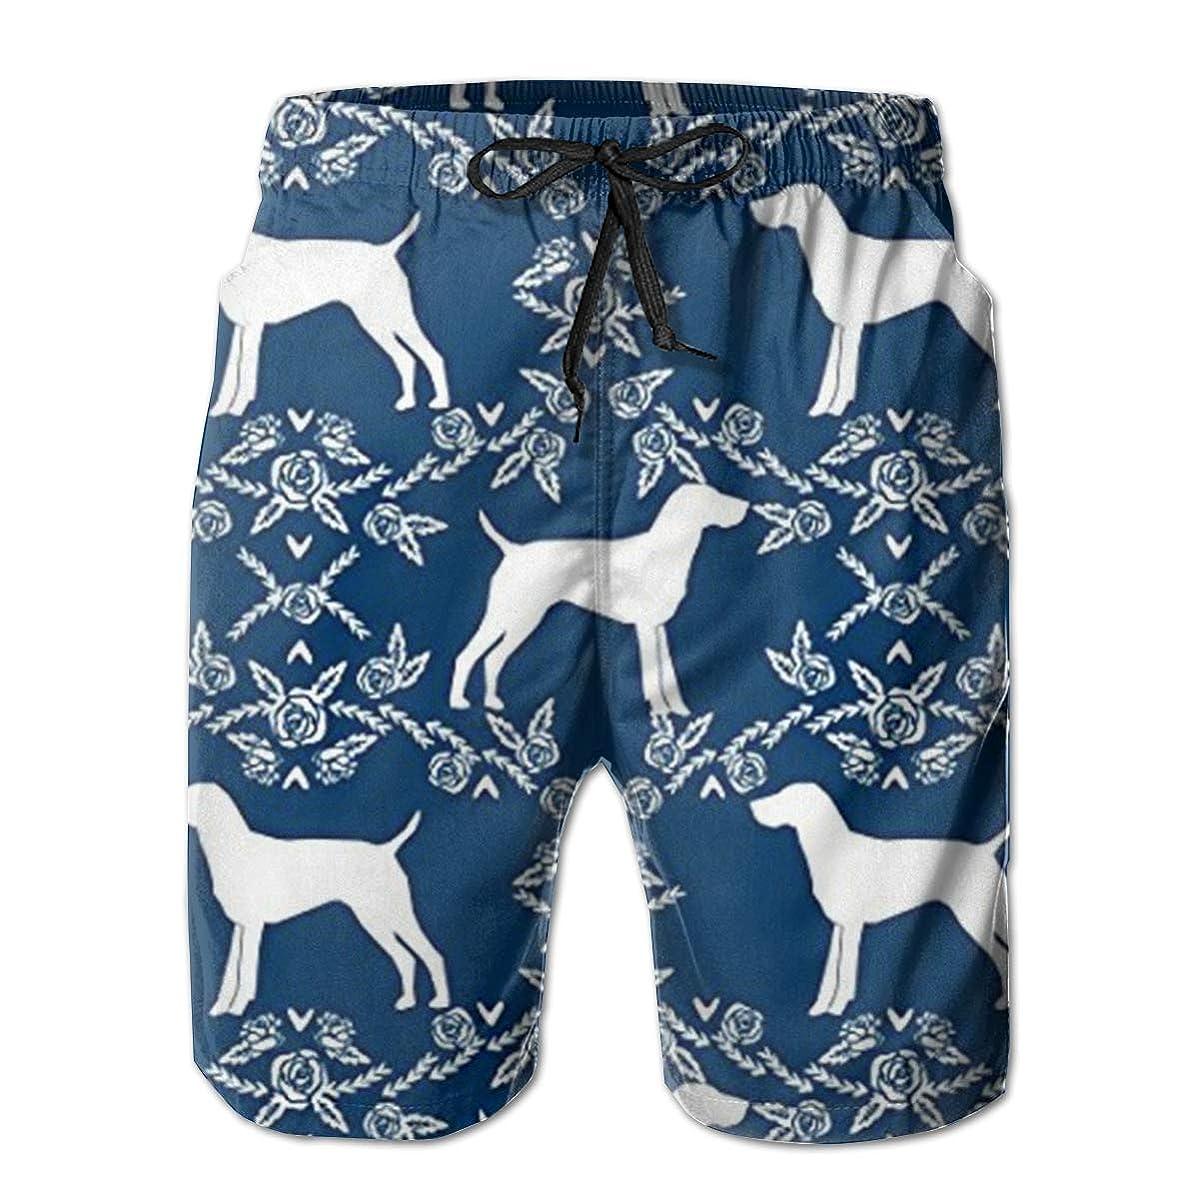 Jiqnajn6 German Shorthair Pointer Dog Men's Swim Trunks Quick Dry Summer Surf Beach Board Shorts with Mesh Lining/Side Pockets